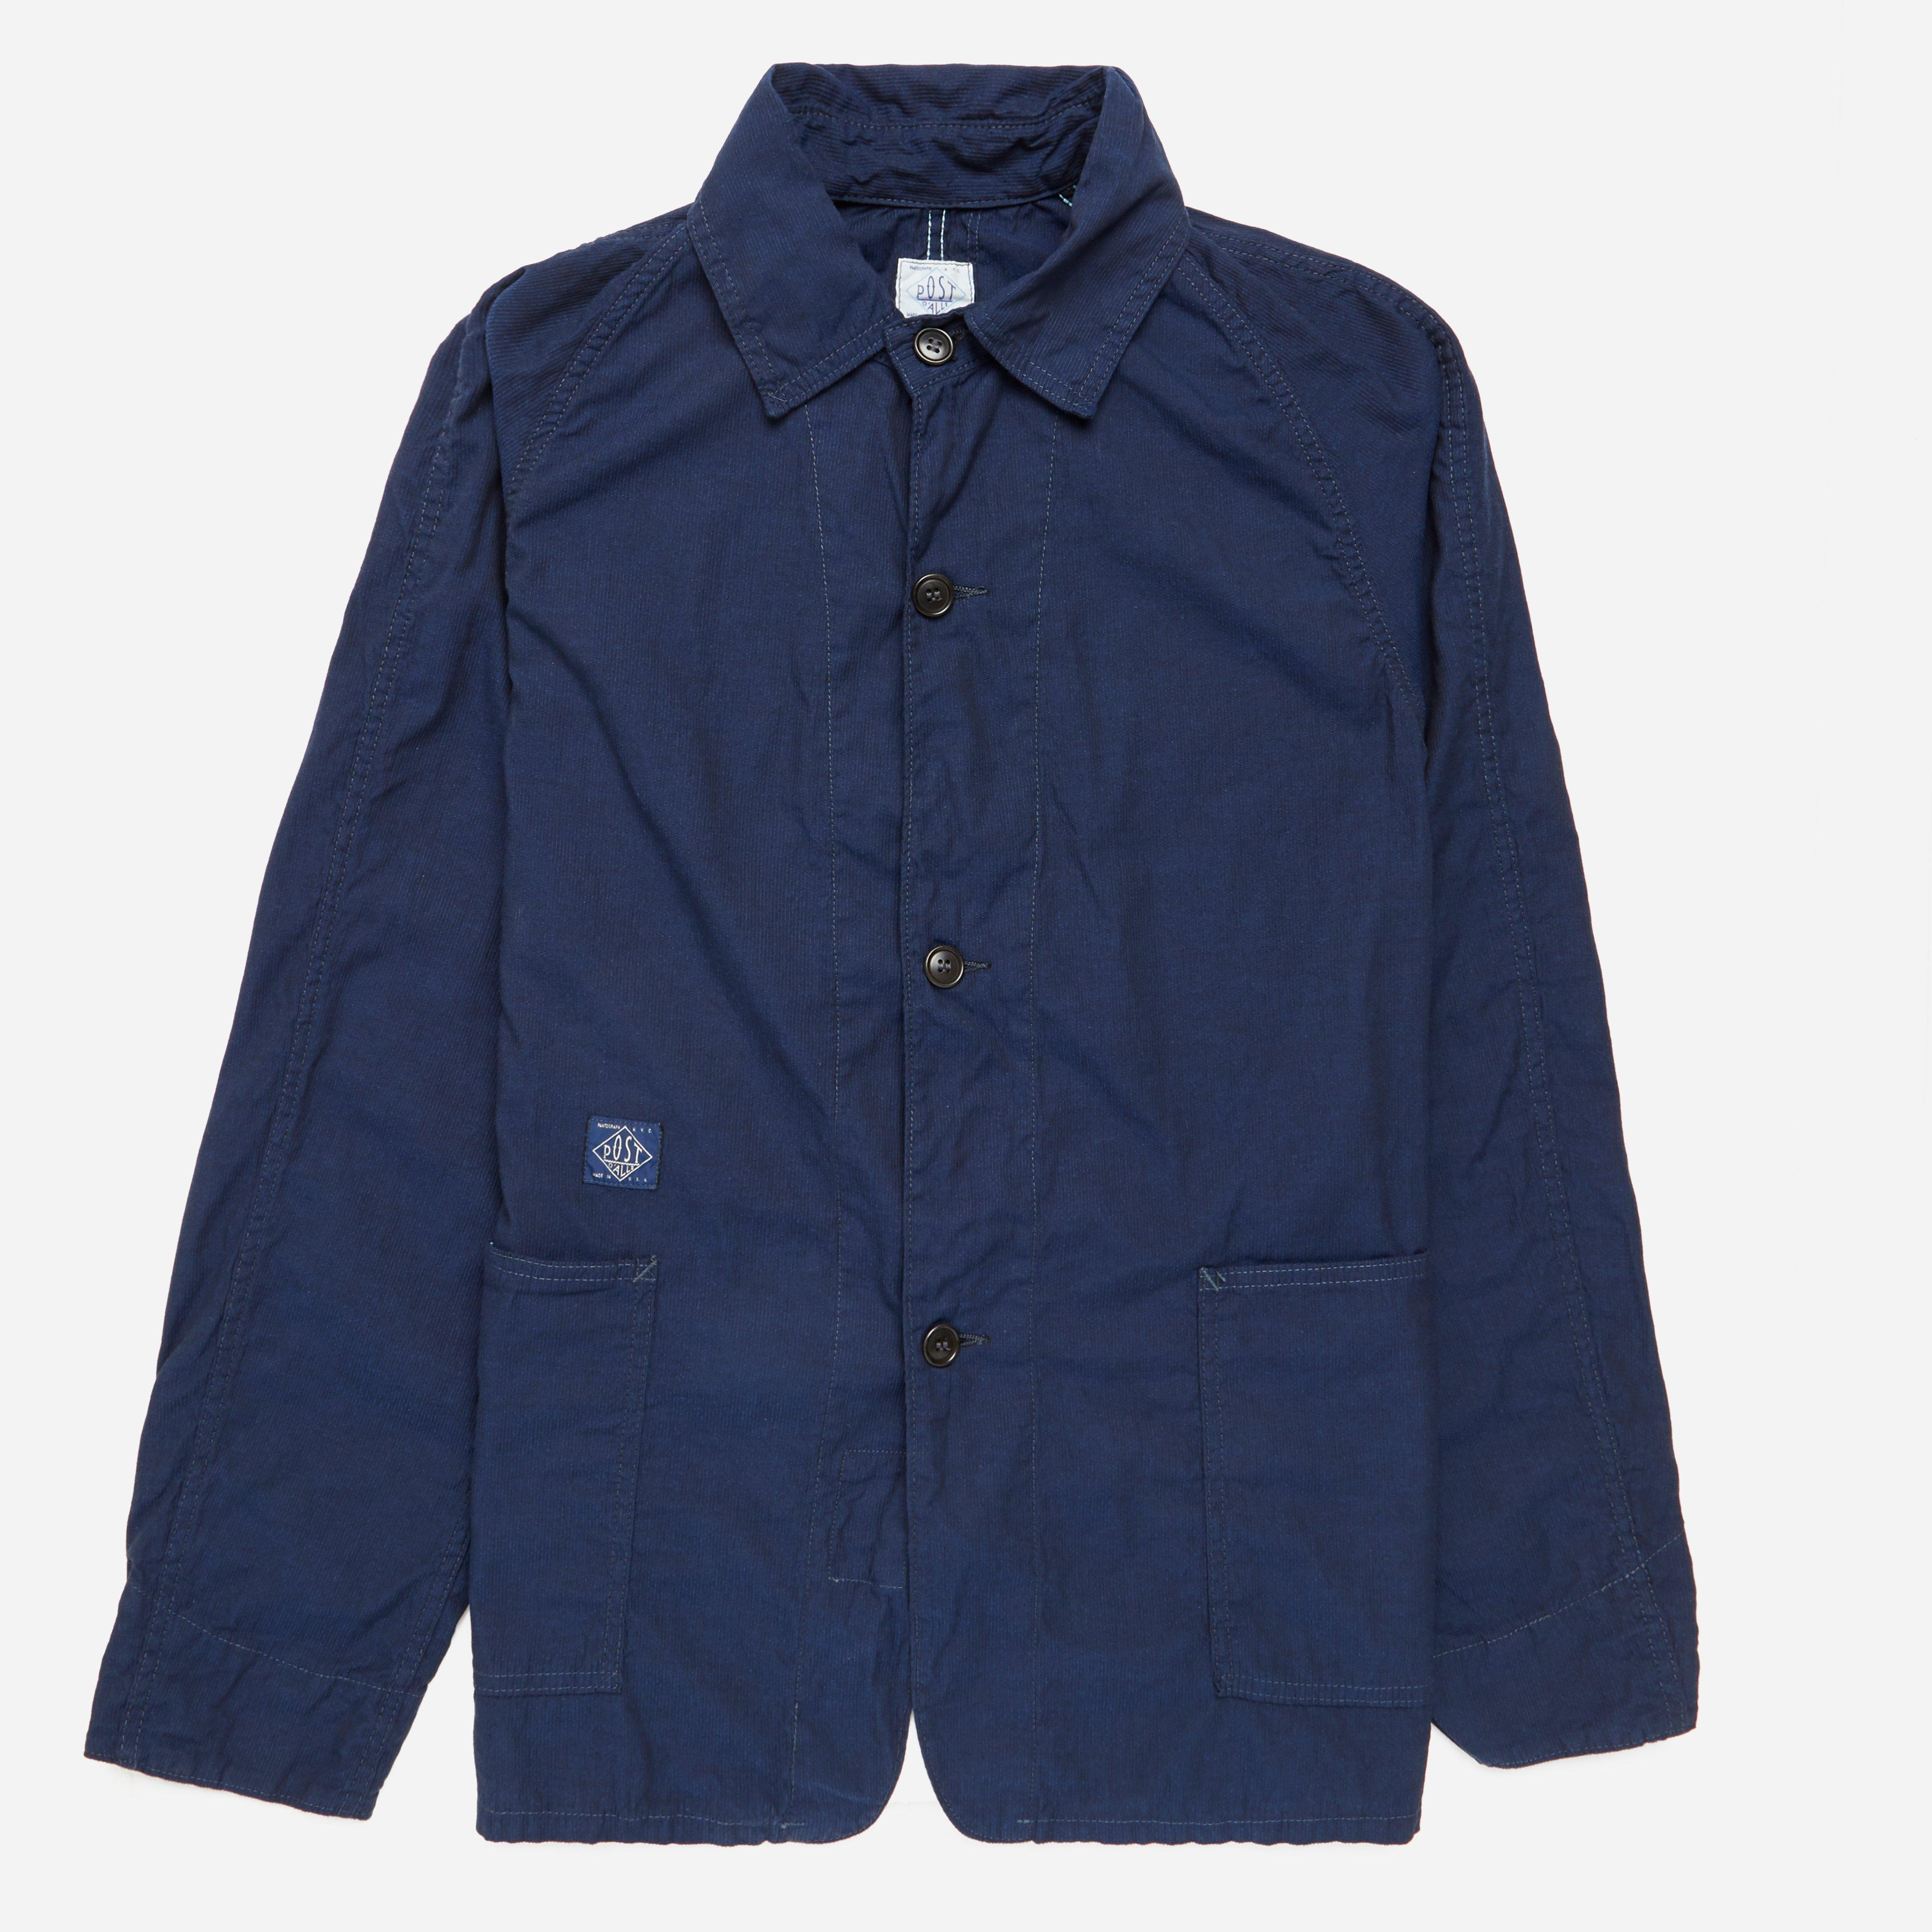 Post Overalls Sweetbear Jacket